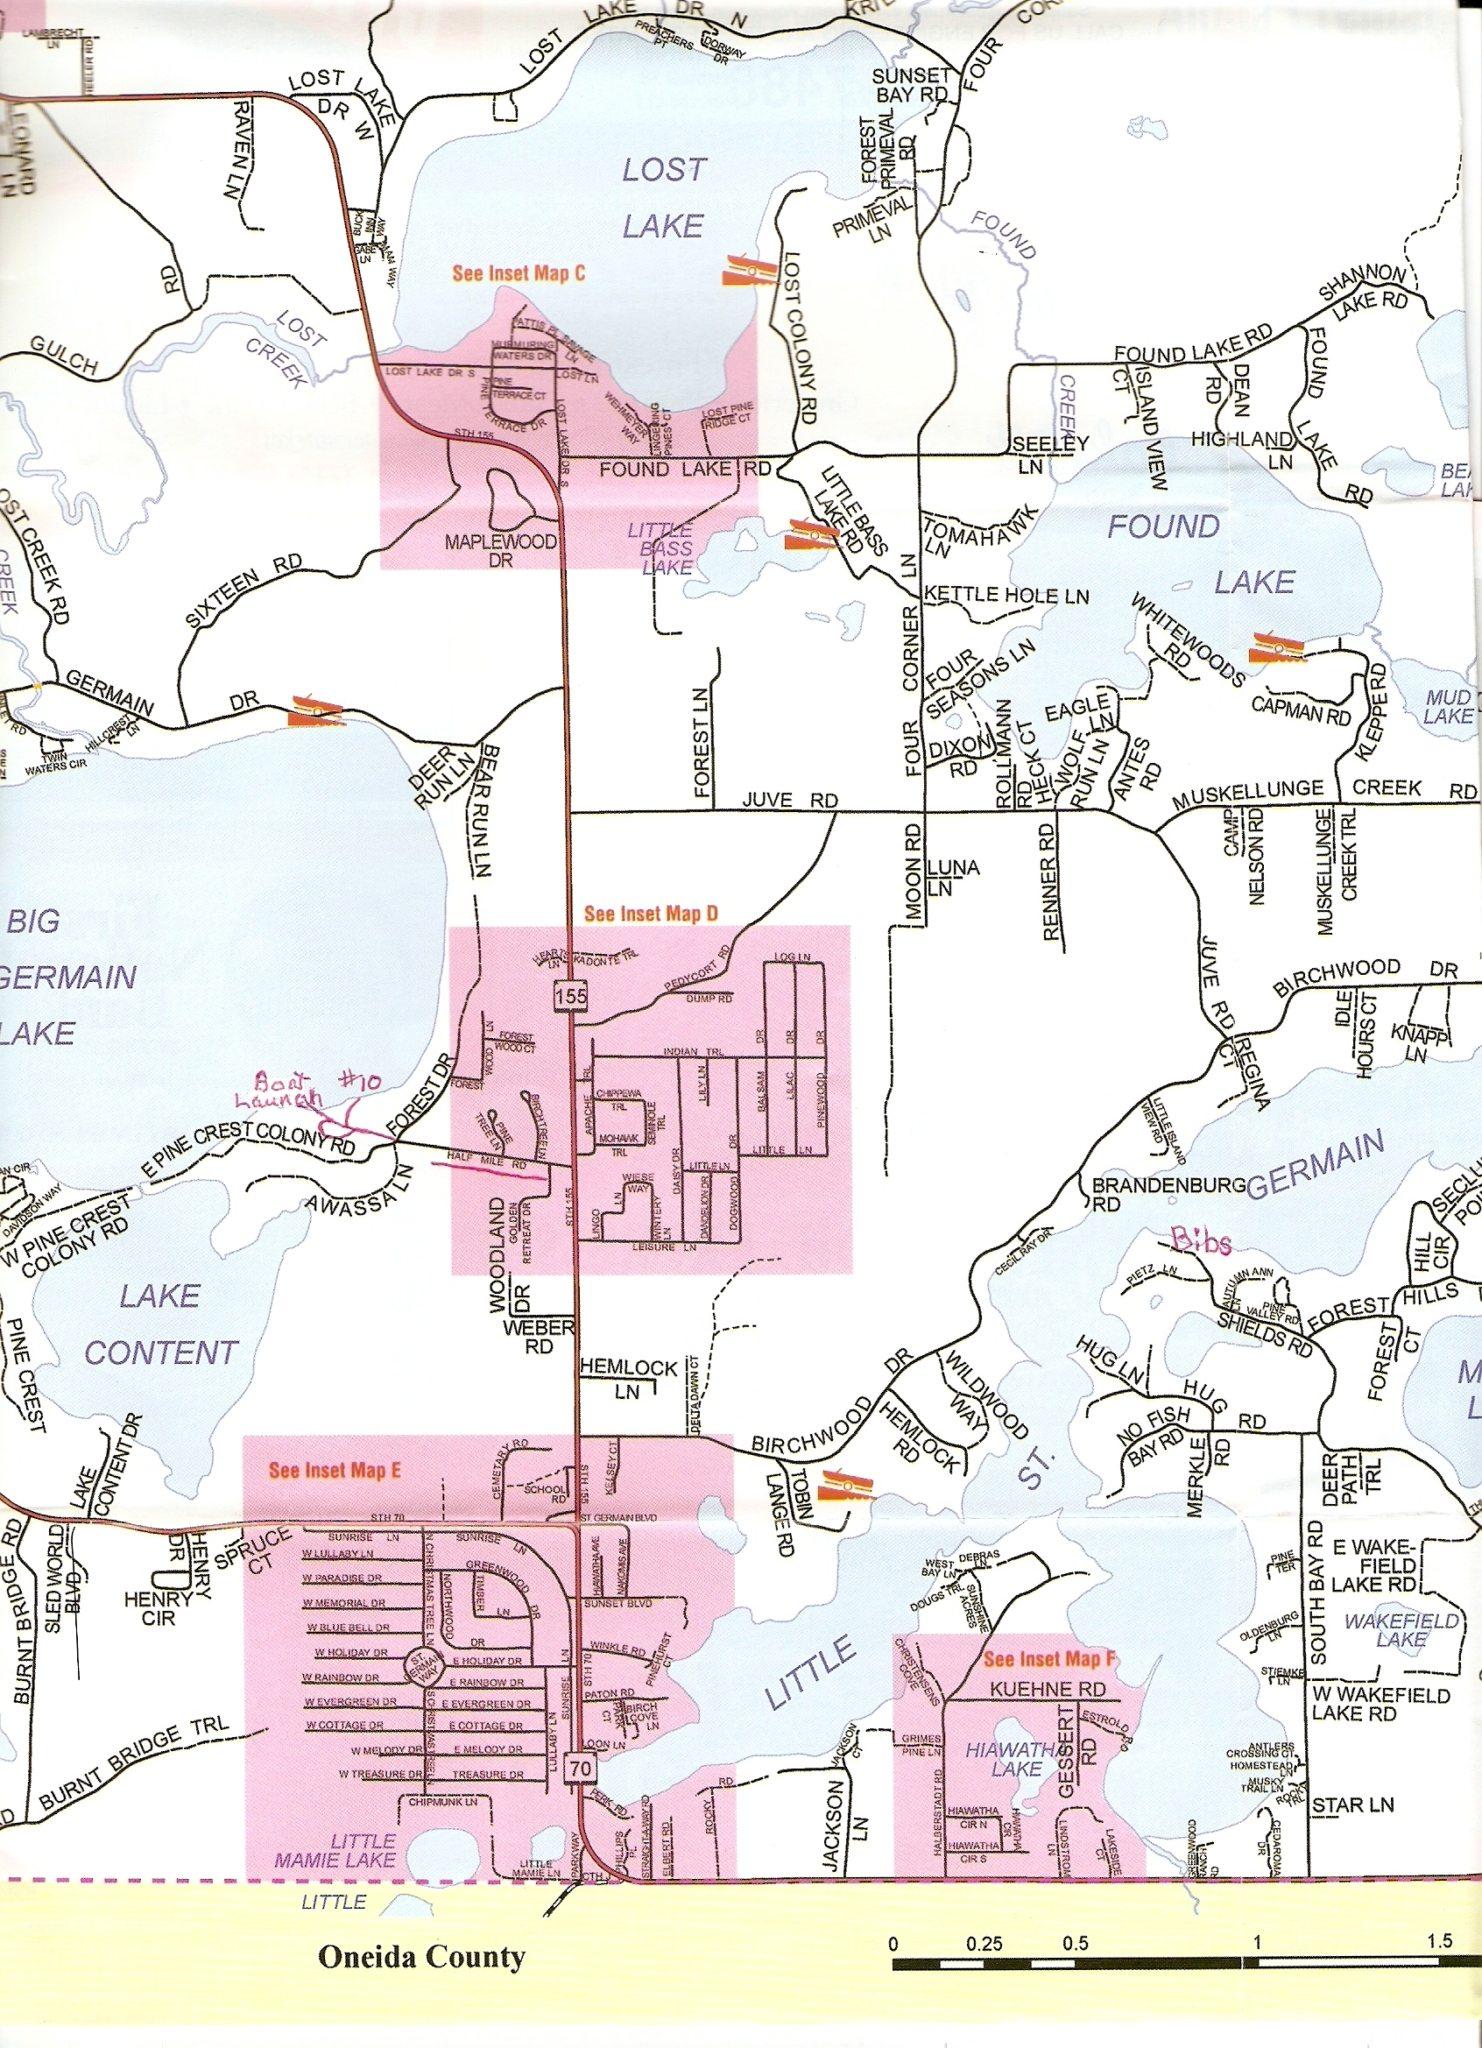 Big St Germain Lake Northern Wisconsin Northwoods